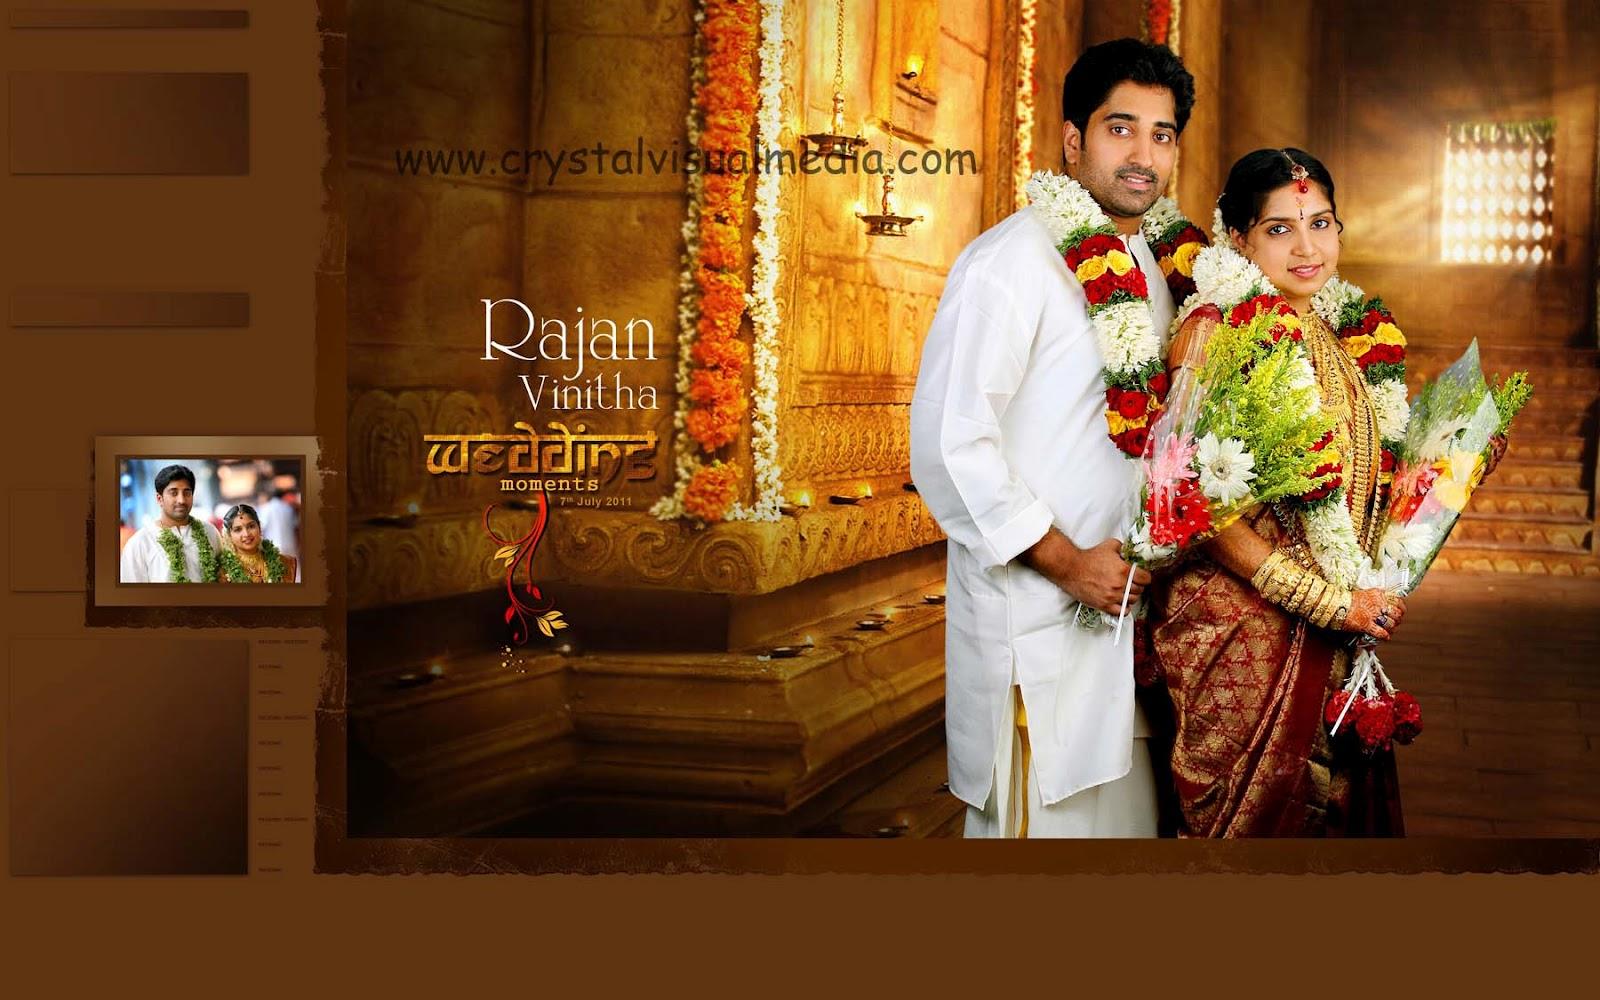 Kerala Wedding Album Cover Design Traffic Club